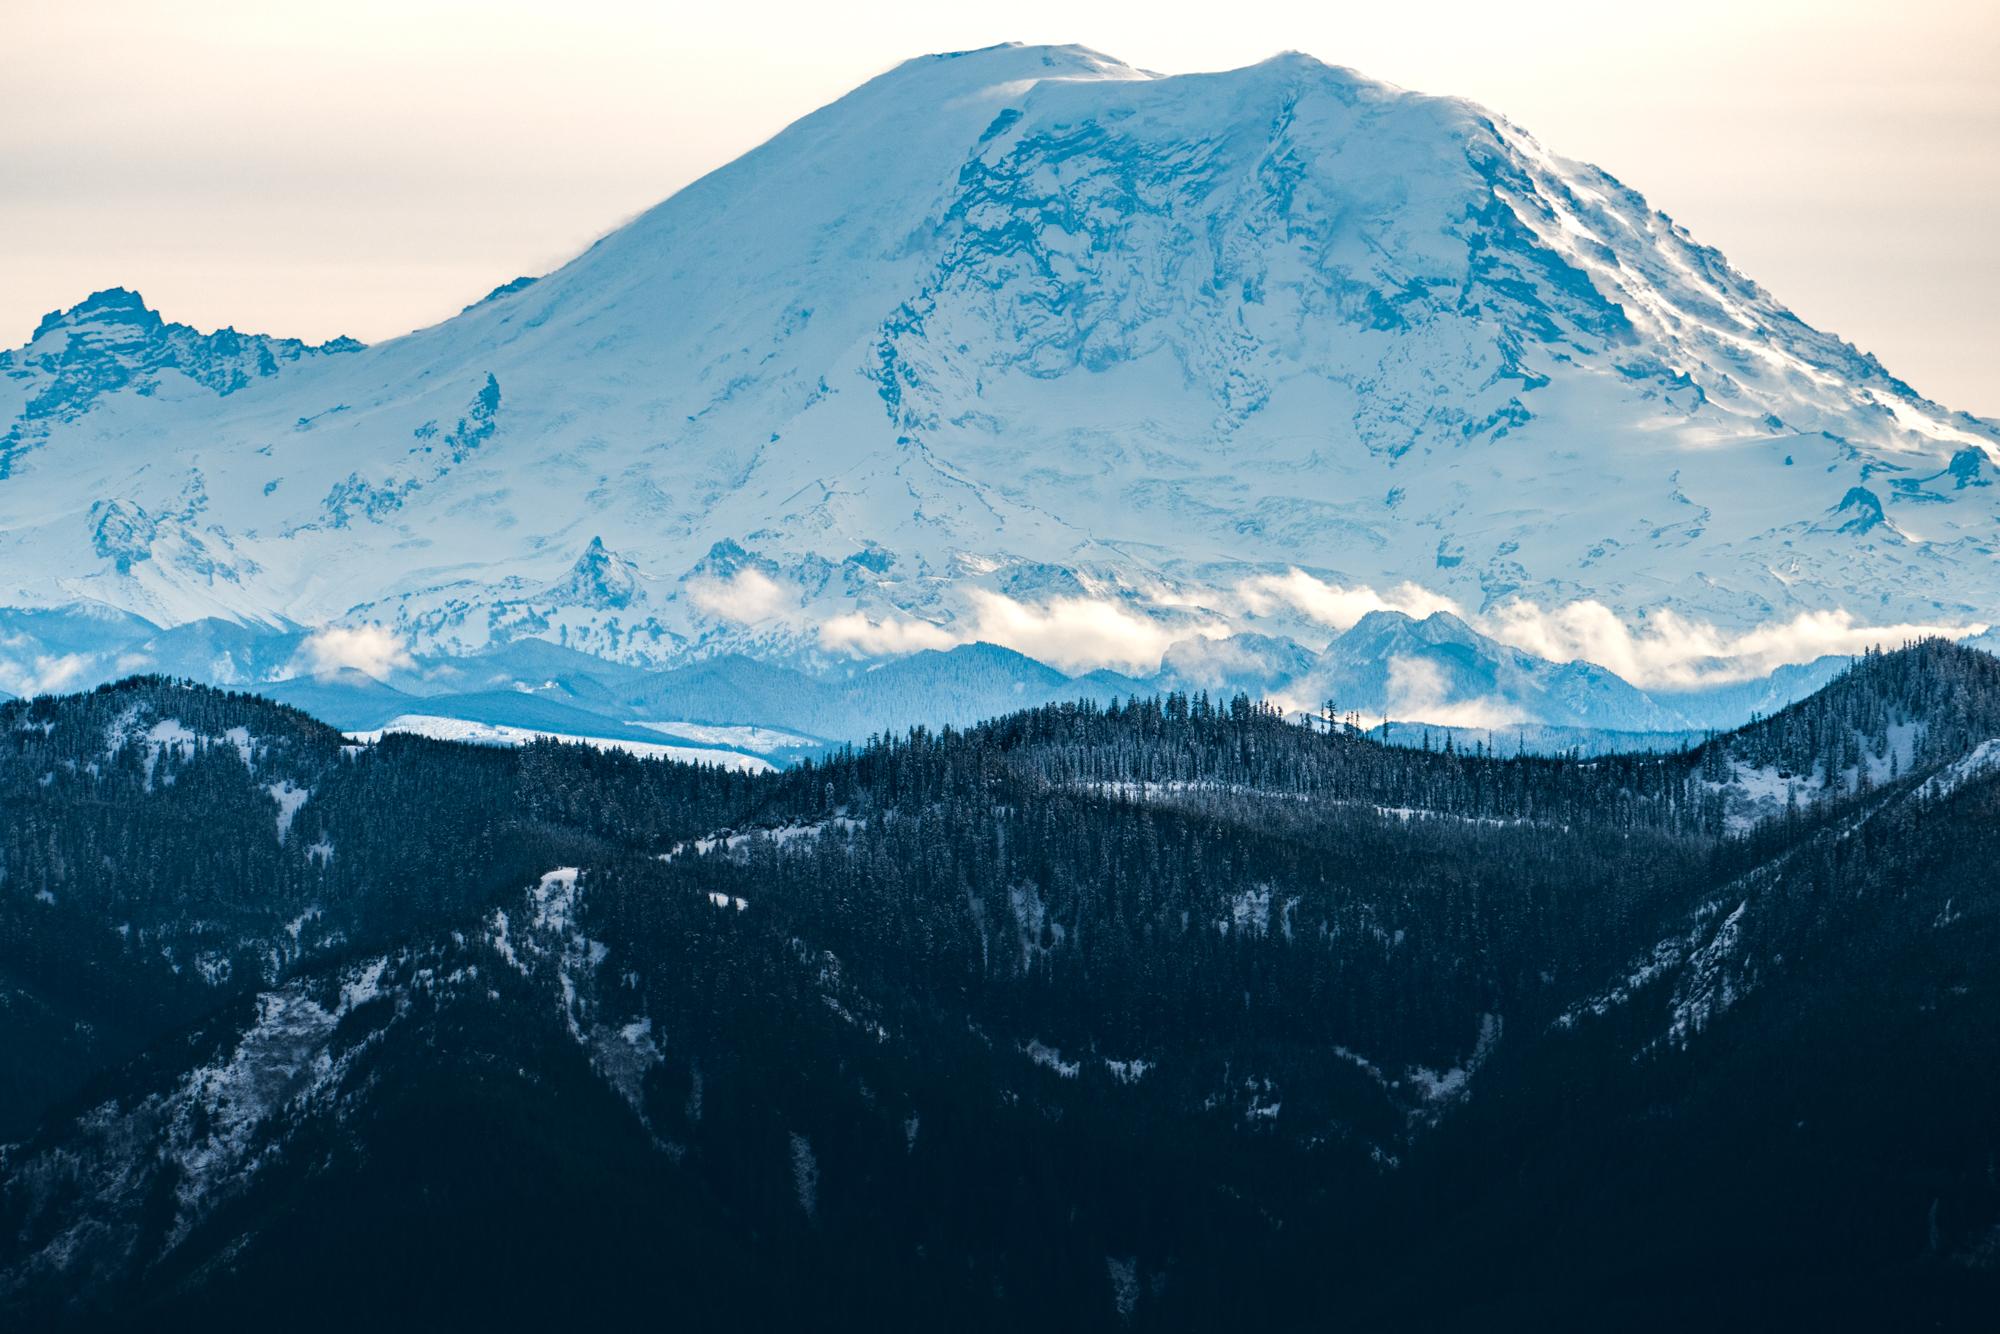 Mt. Rainier as seen from Mt. Si.